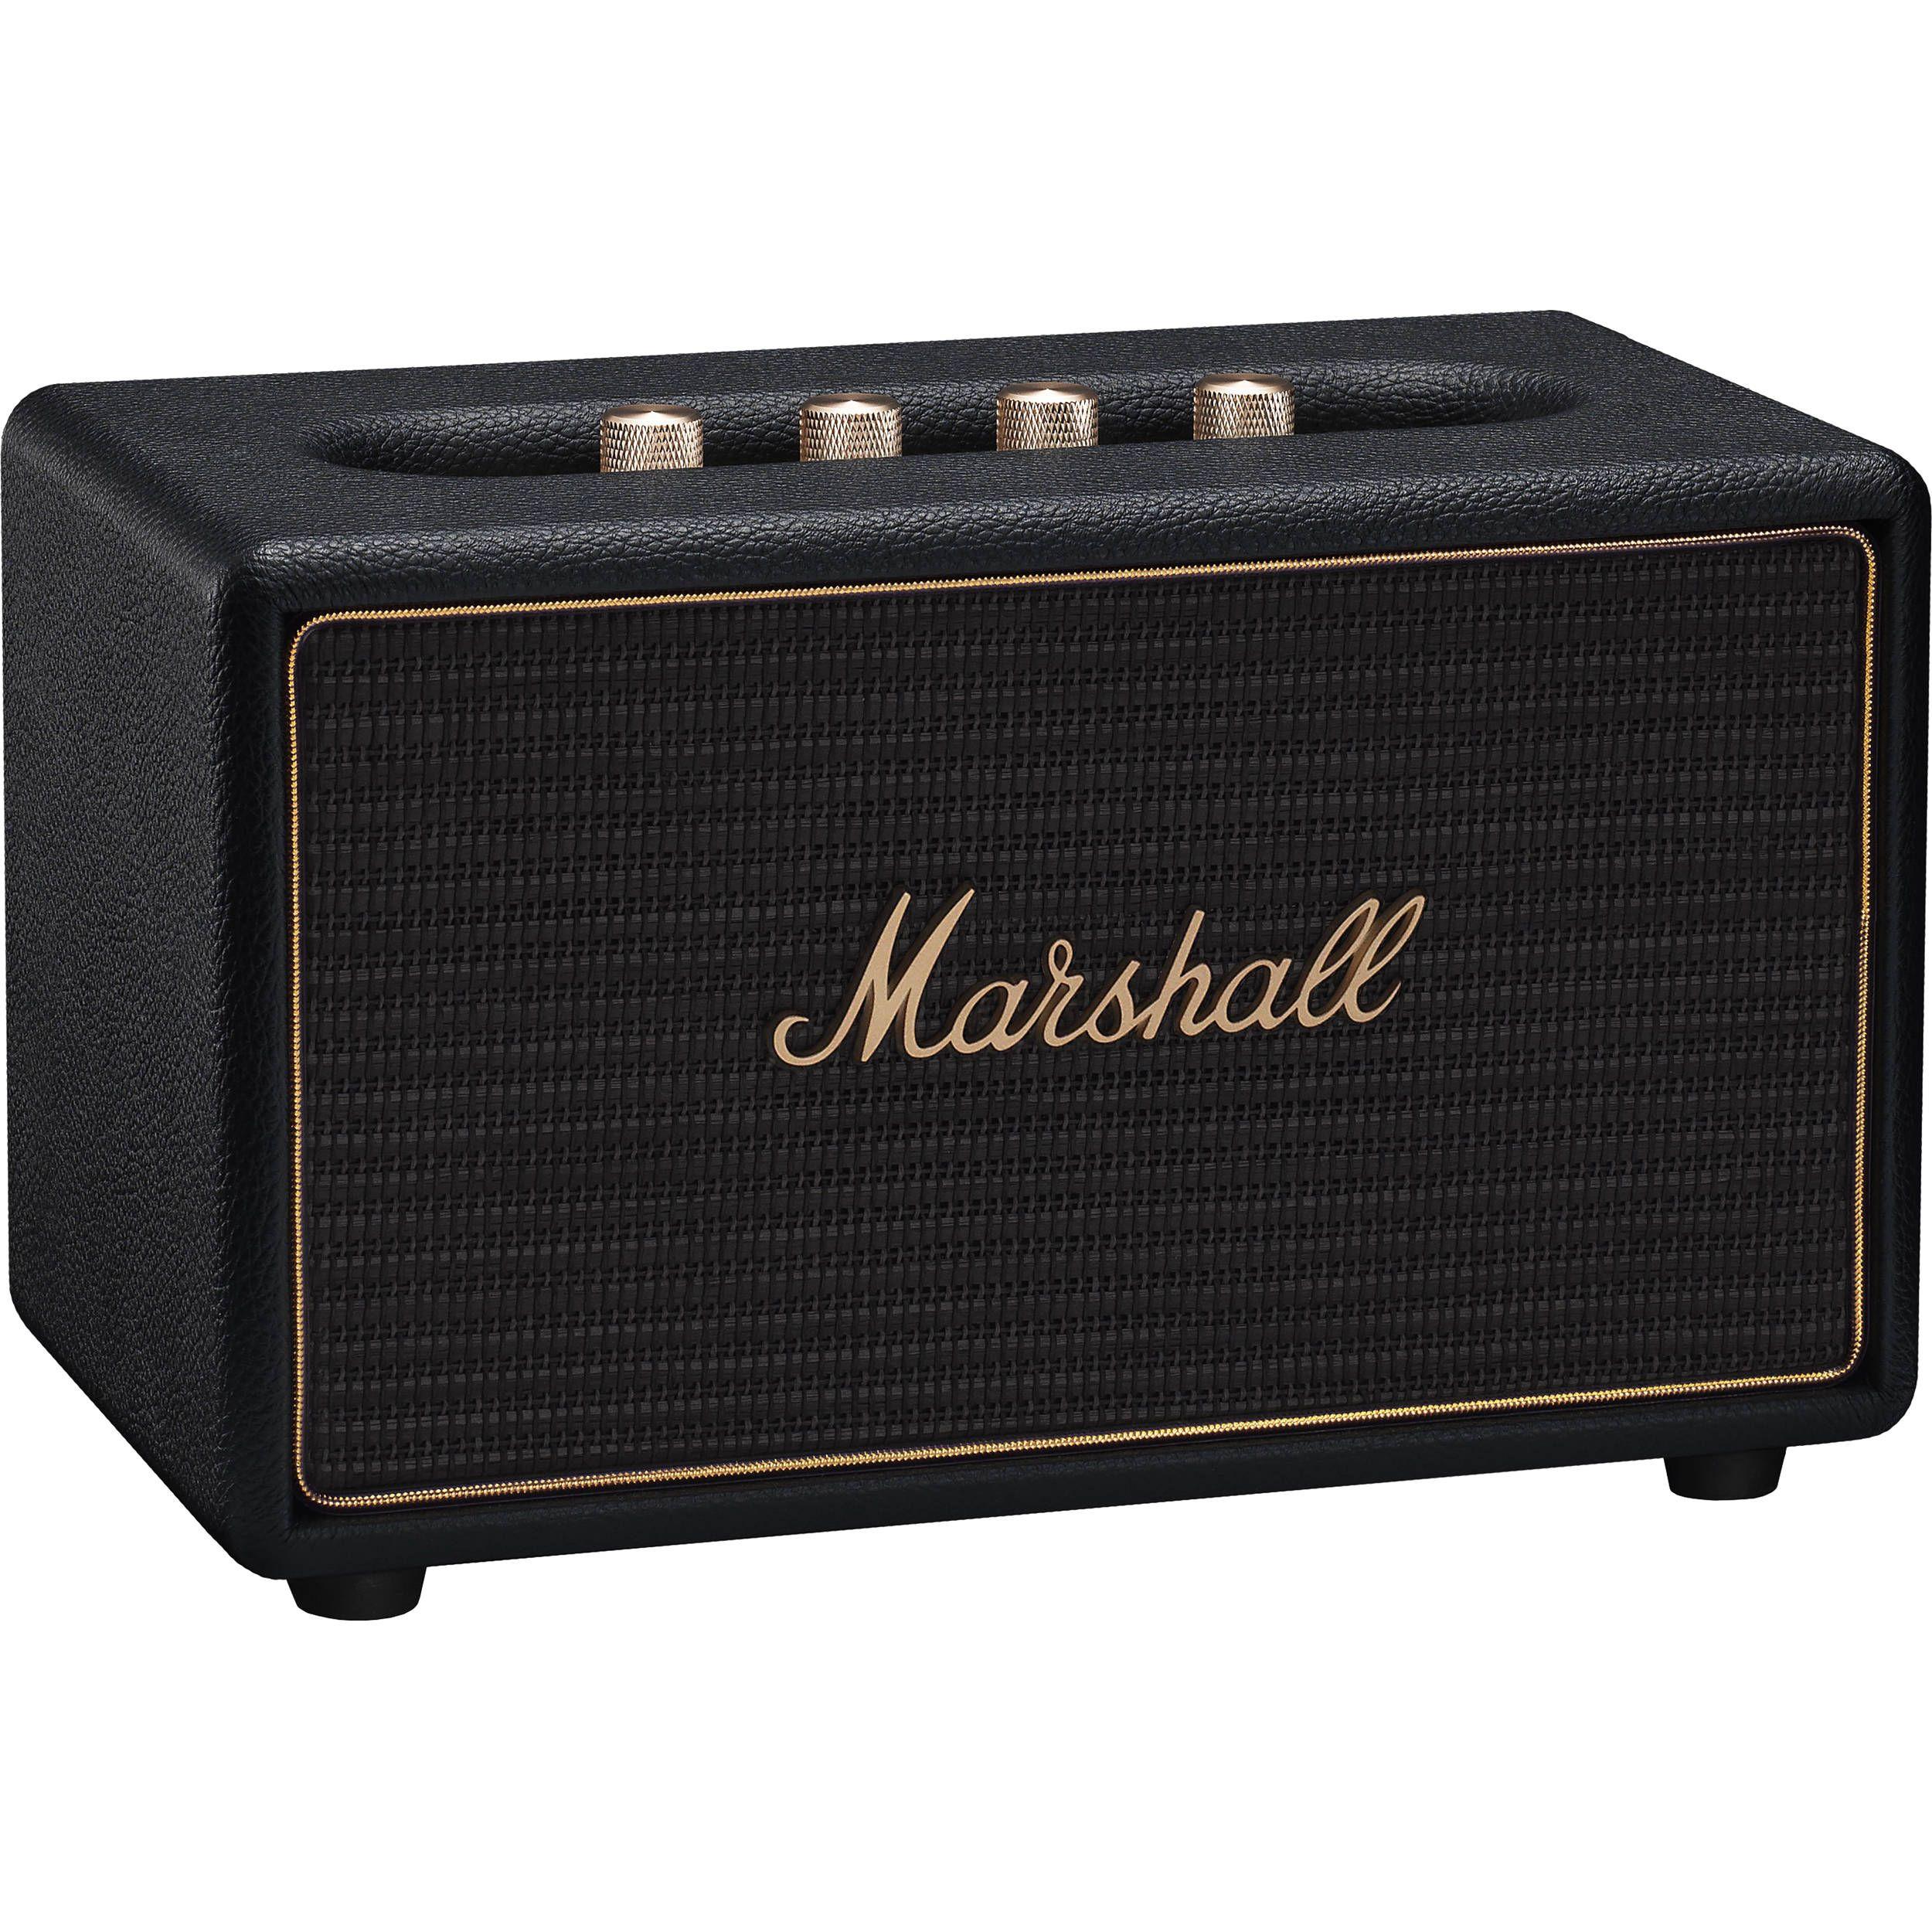 Marshall Acton Multiroom: Lautsprecher (WiFi, Bluetooth, Chromecast, AirPlay, Spotify Connect)